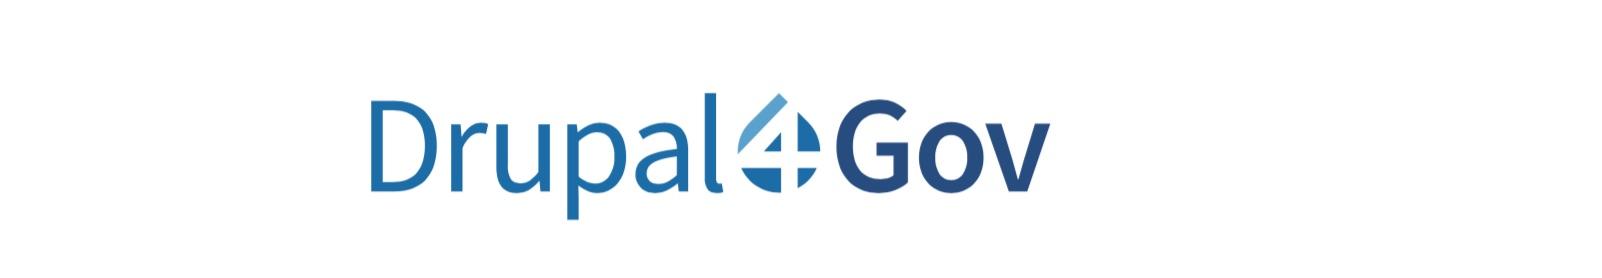 Drupal4Gov logo